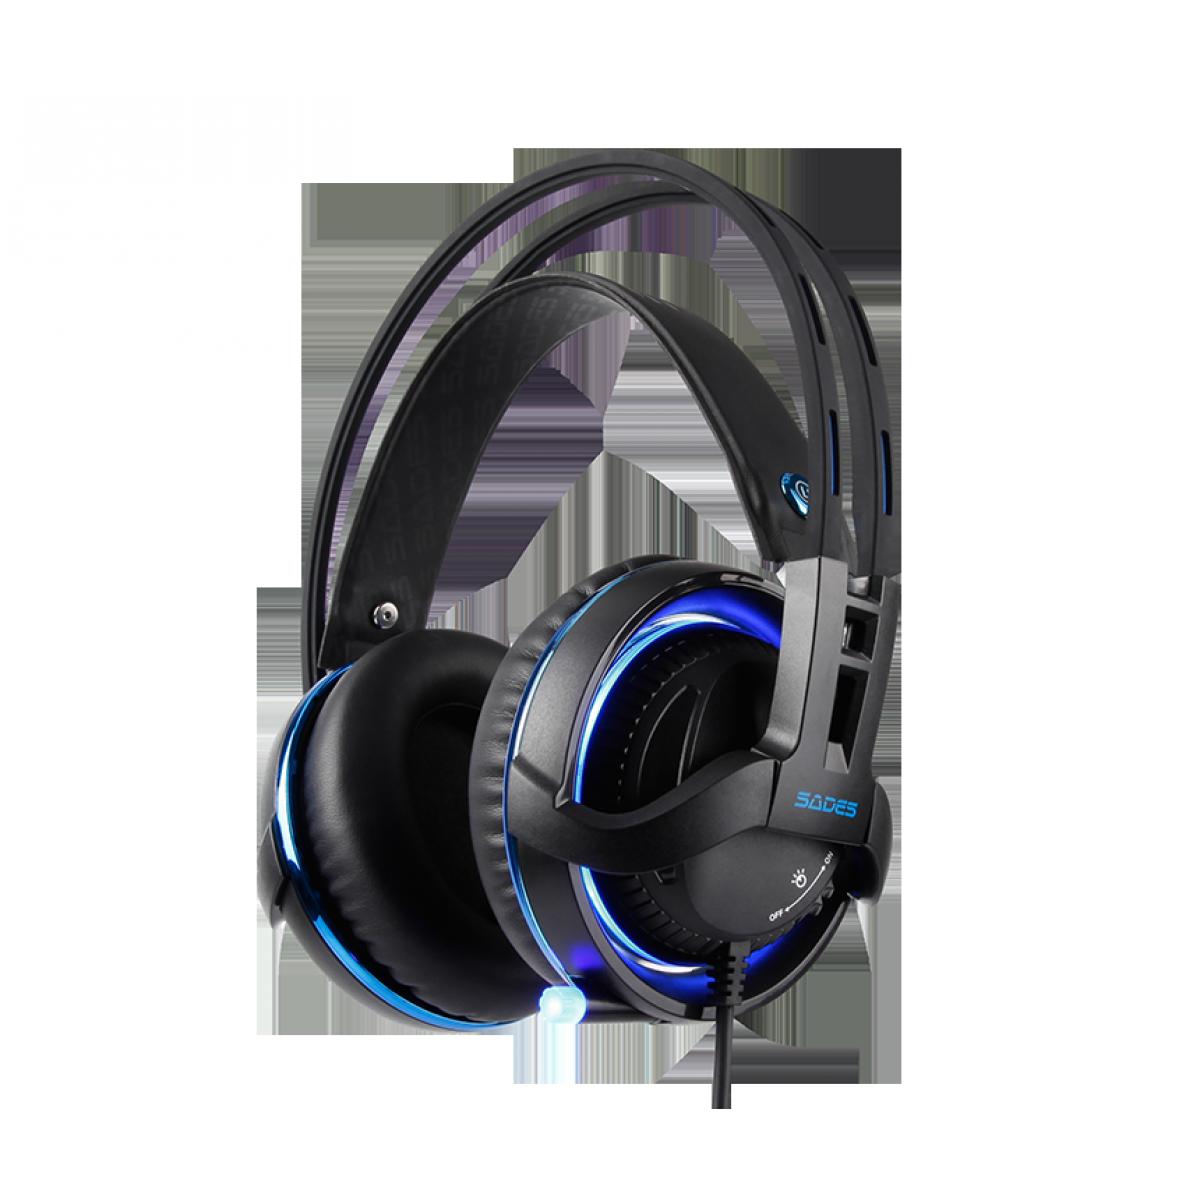 Headset Gamer Sades Sa-916 Diablo, RGB, Stereo, Black, Sa-916